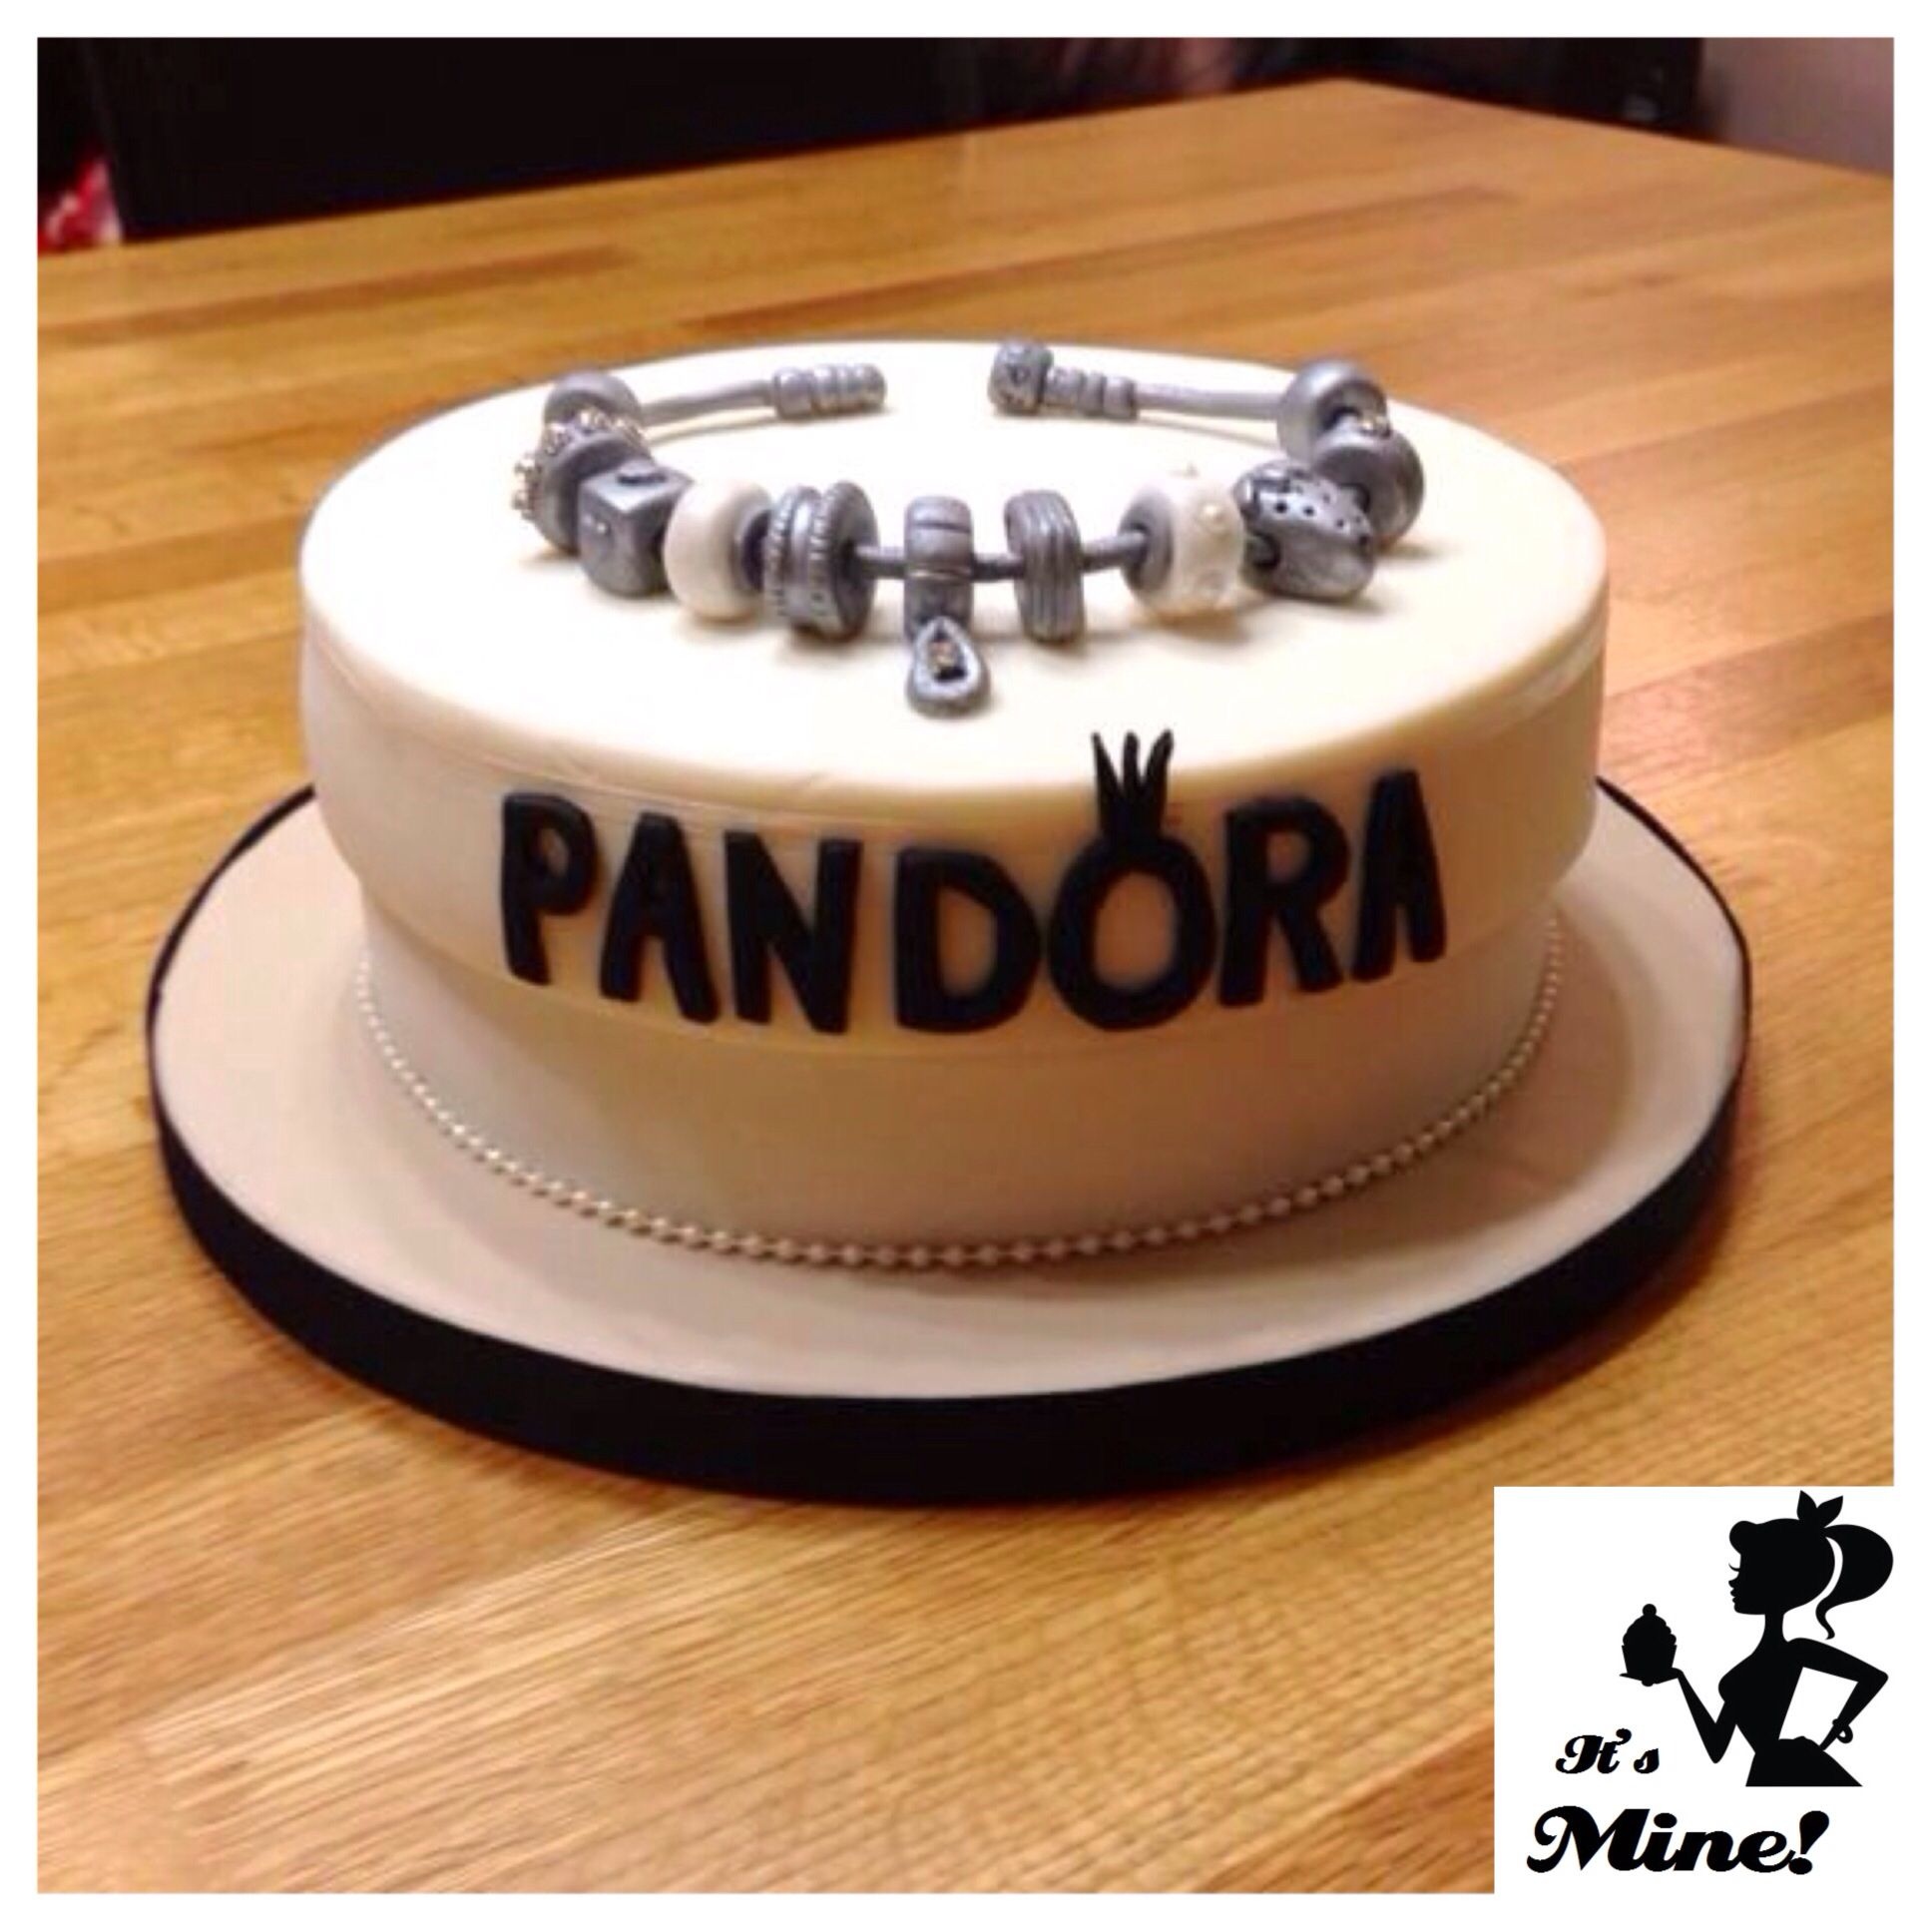 84901e6ff Pandora charm bracelet cake. Not a GWP but really cool. | ♕Share ...